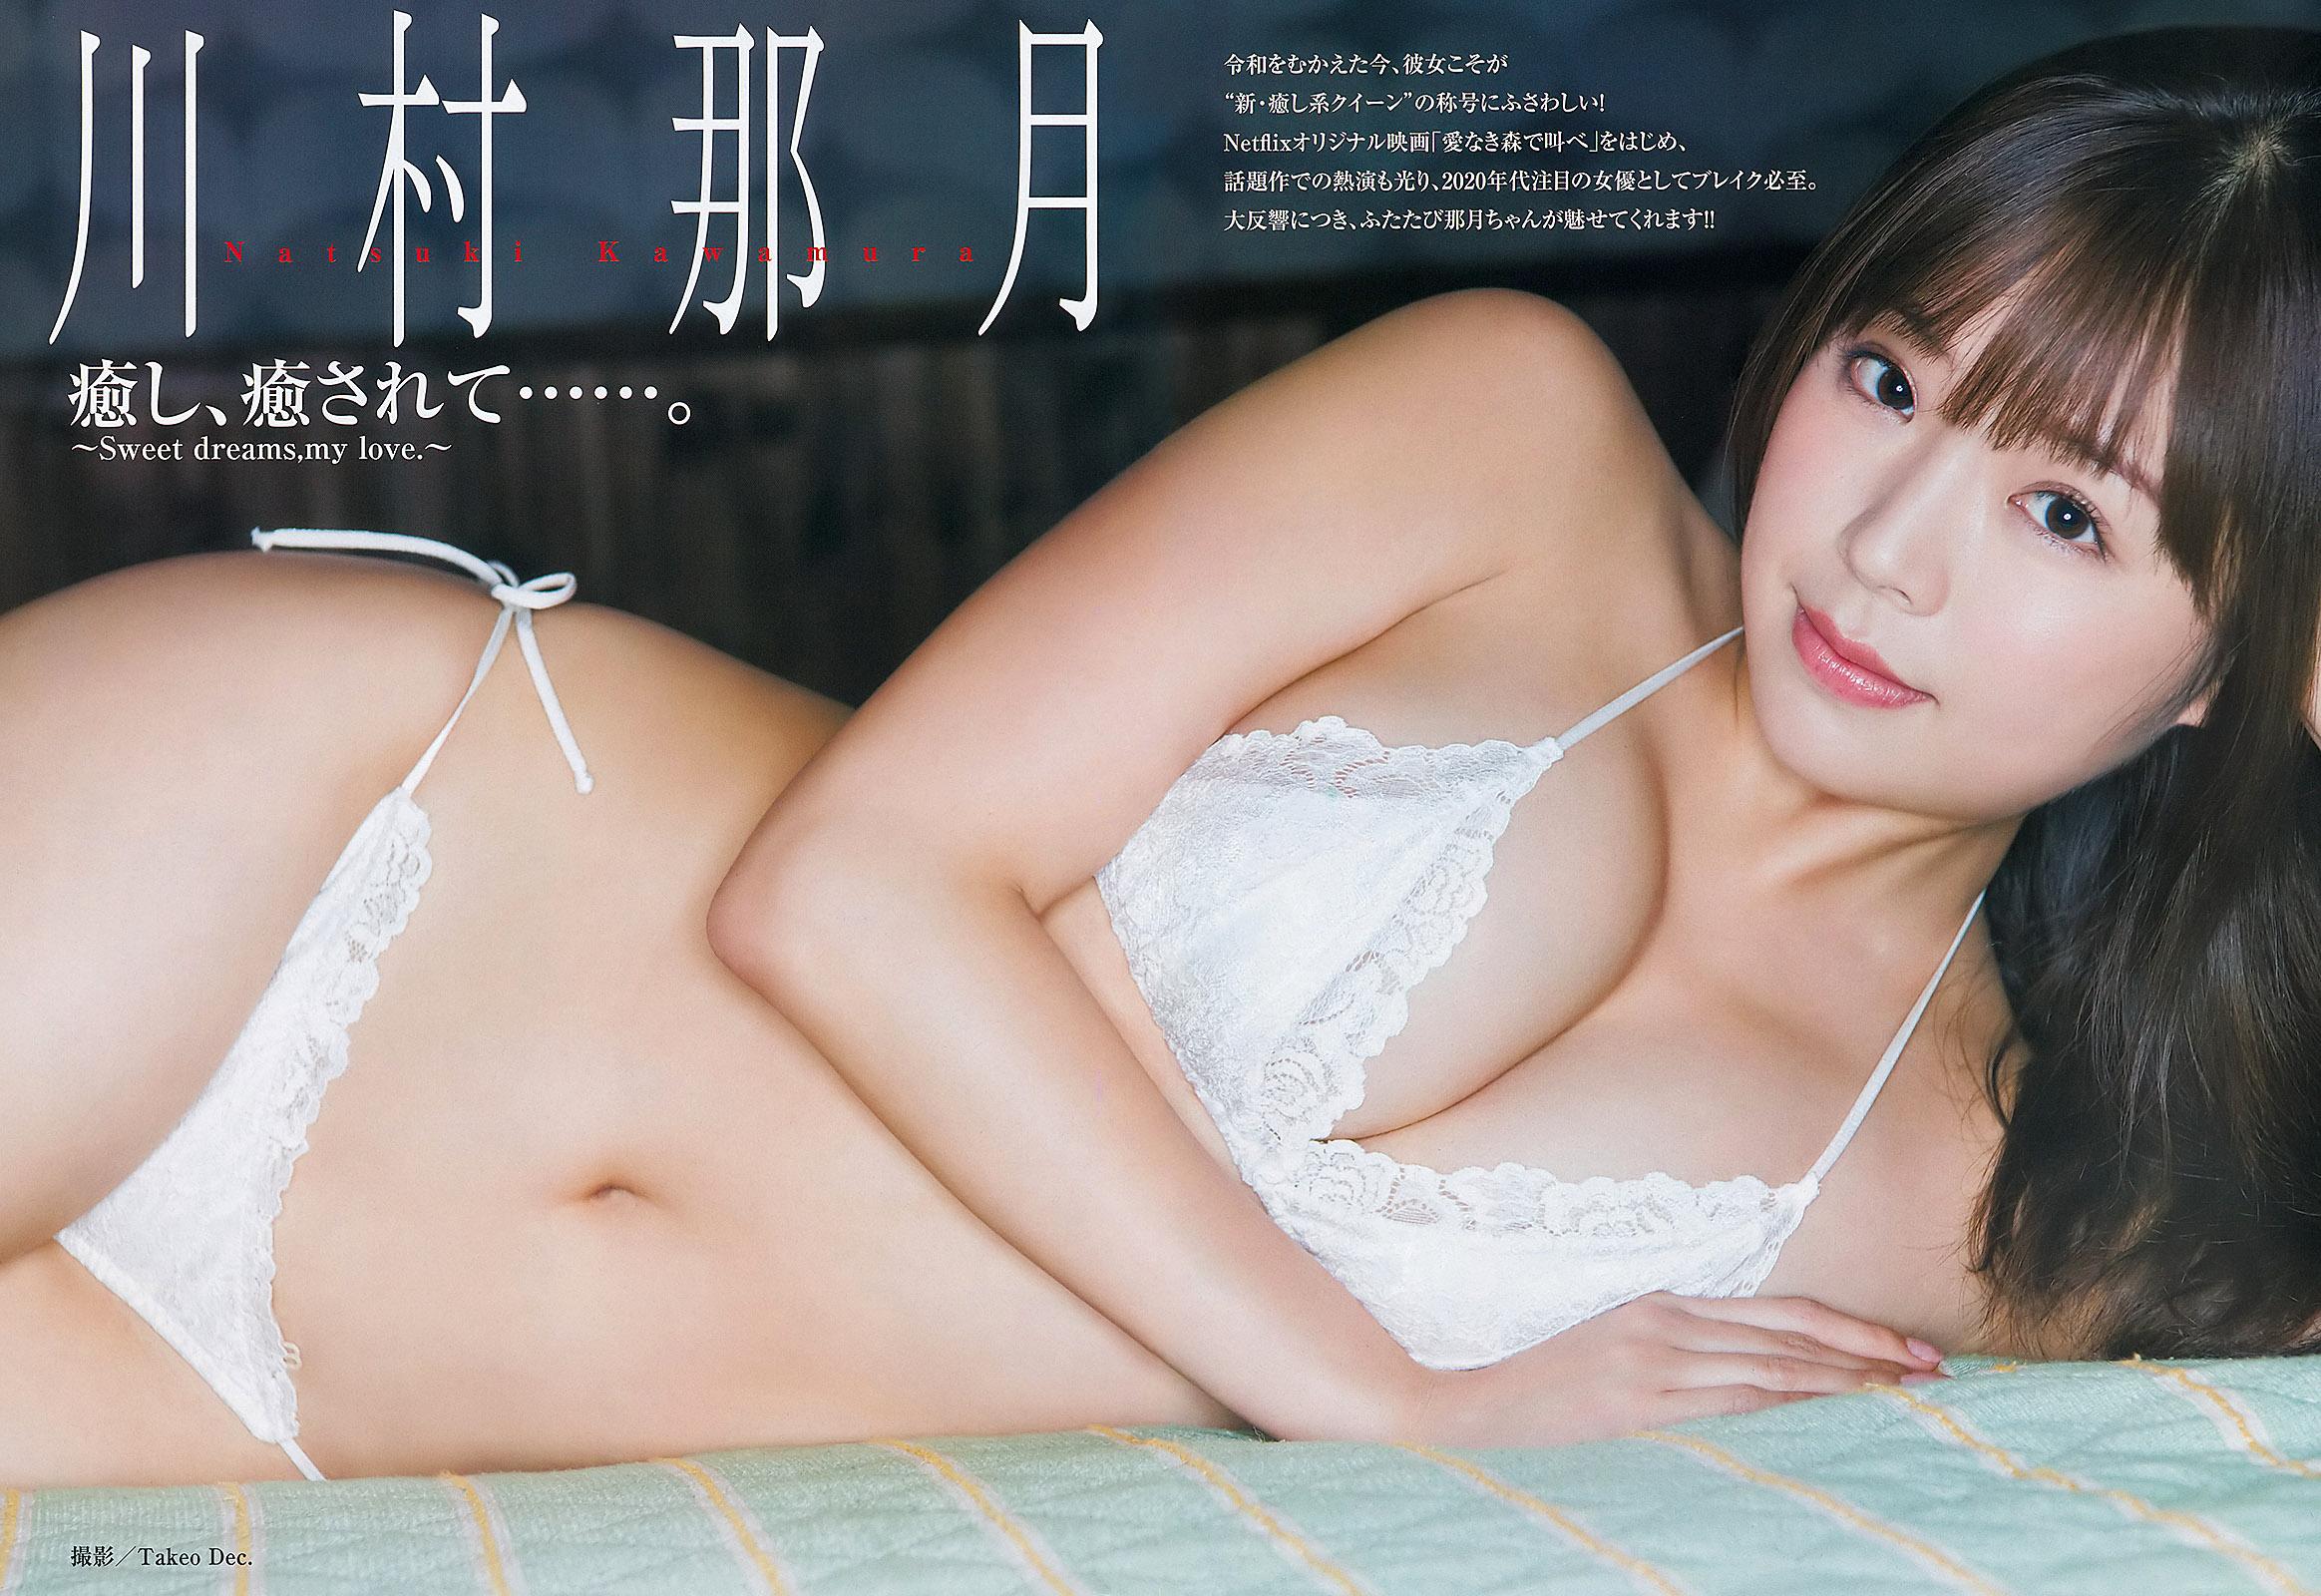 Natsuki Kawamura Young Jump 200206 01.jpg